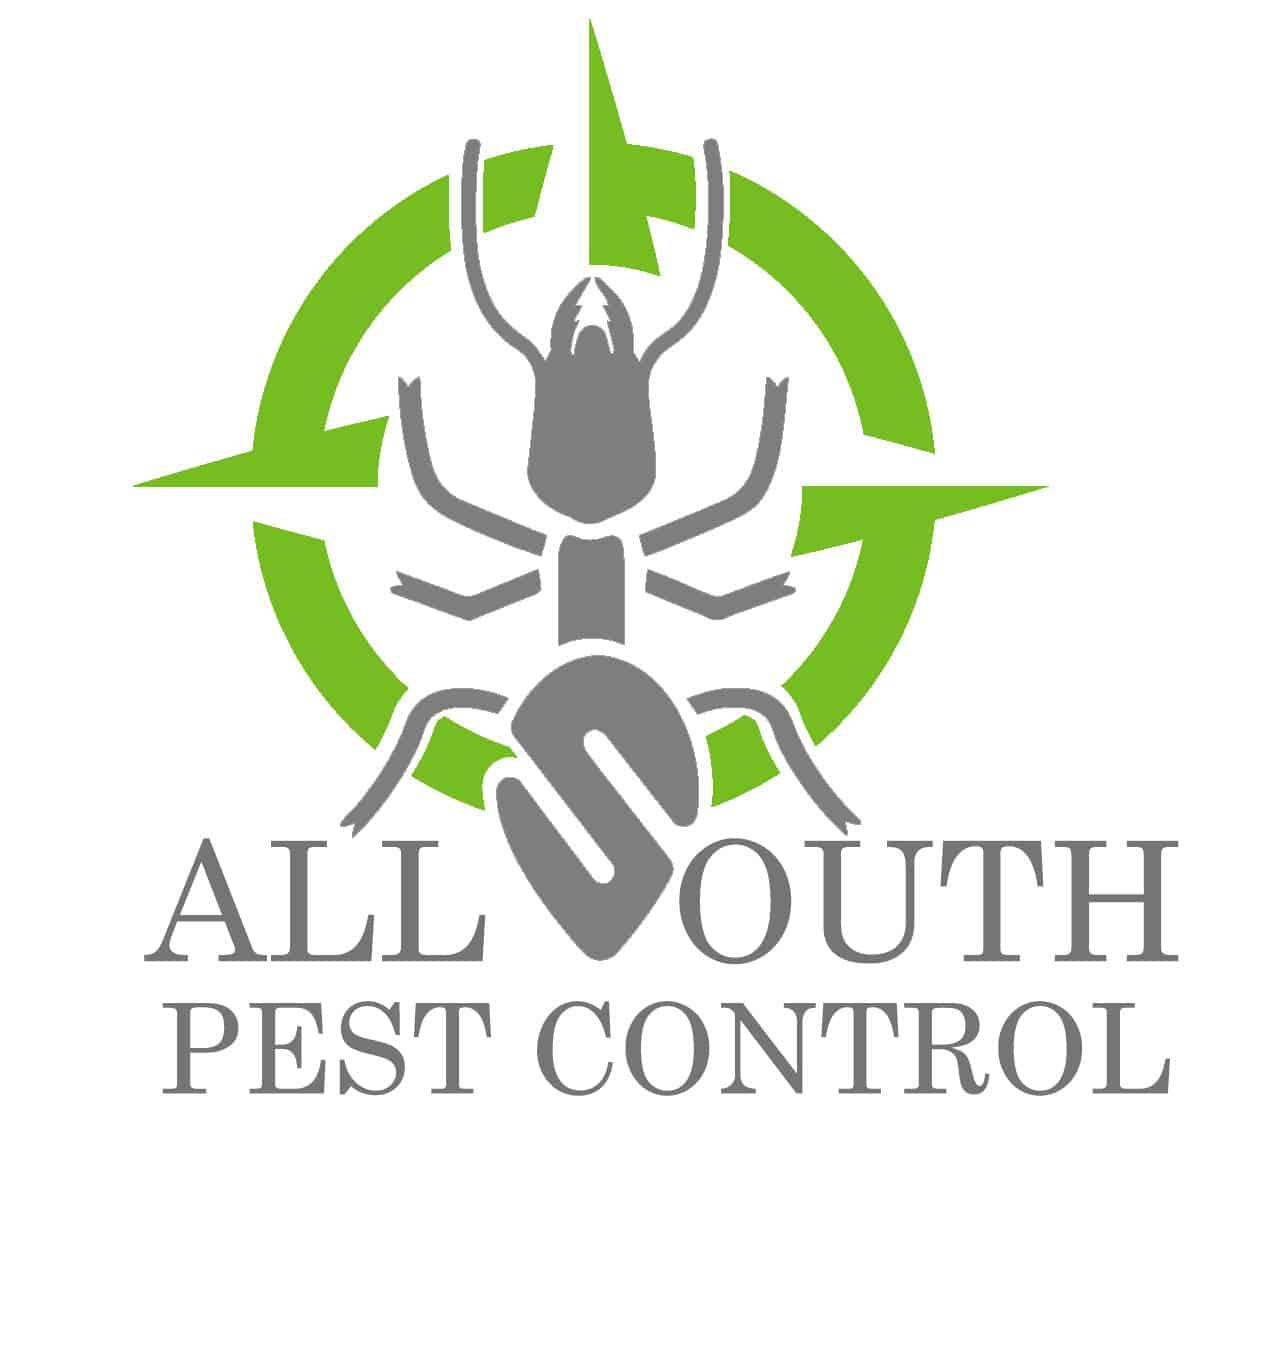 All South Pest Control